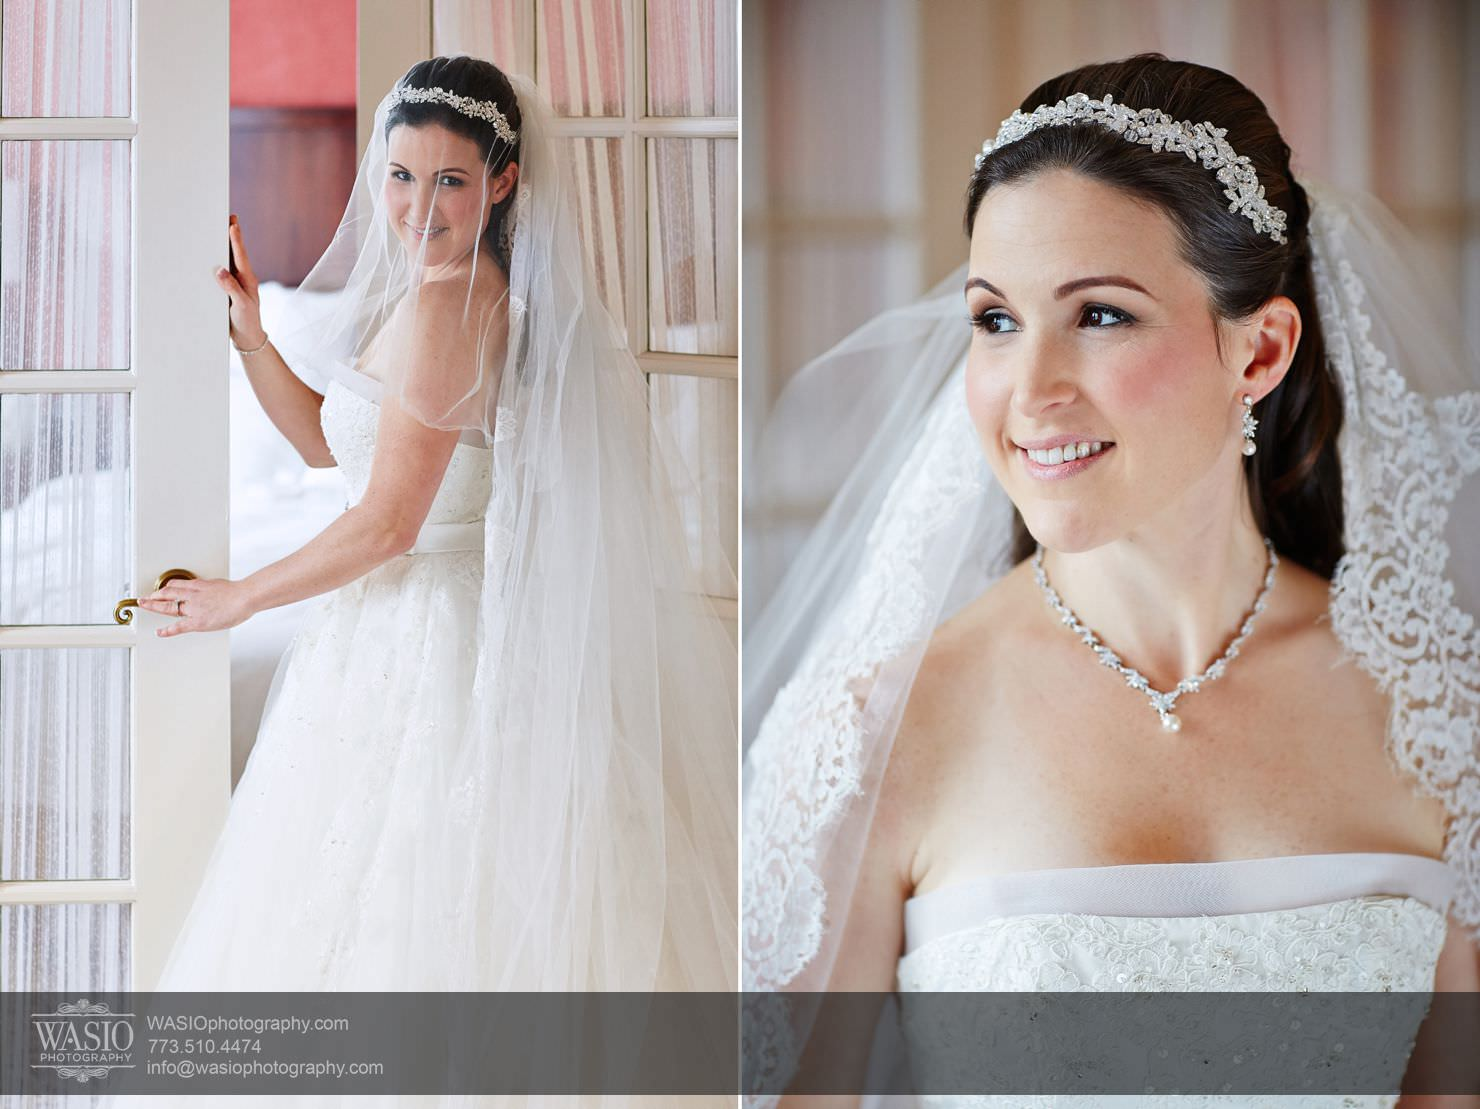 Rosemont-Fall-Wedding-Lauren-and-David-003 Rosemont Fall Wedding - Lauren + David